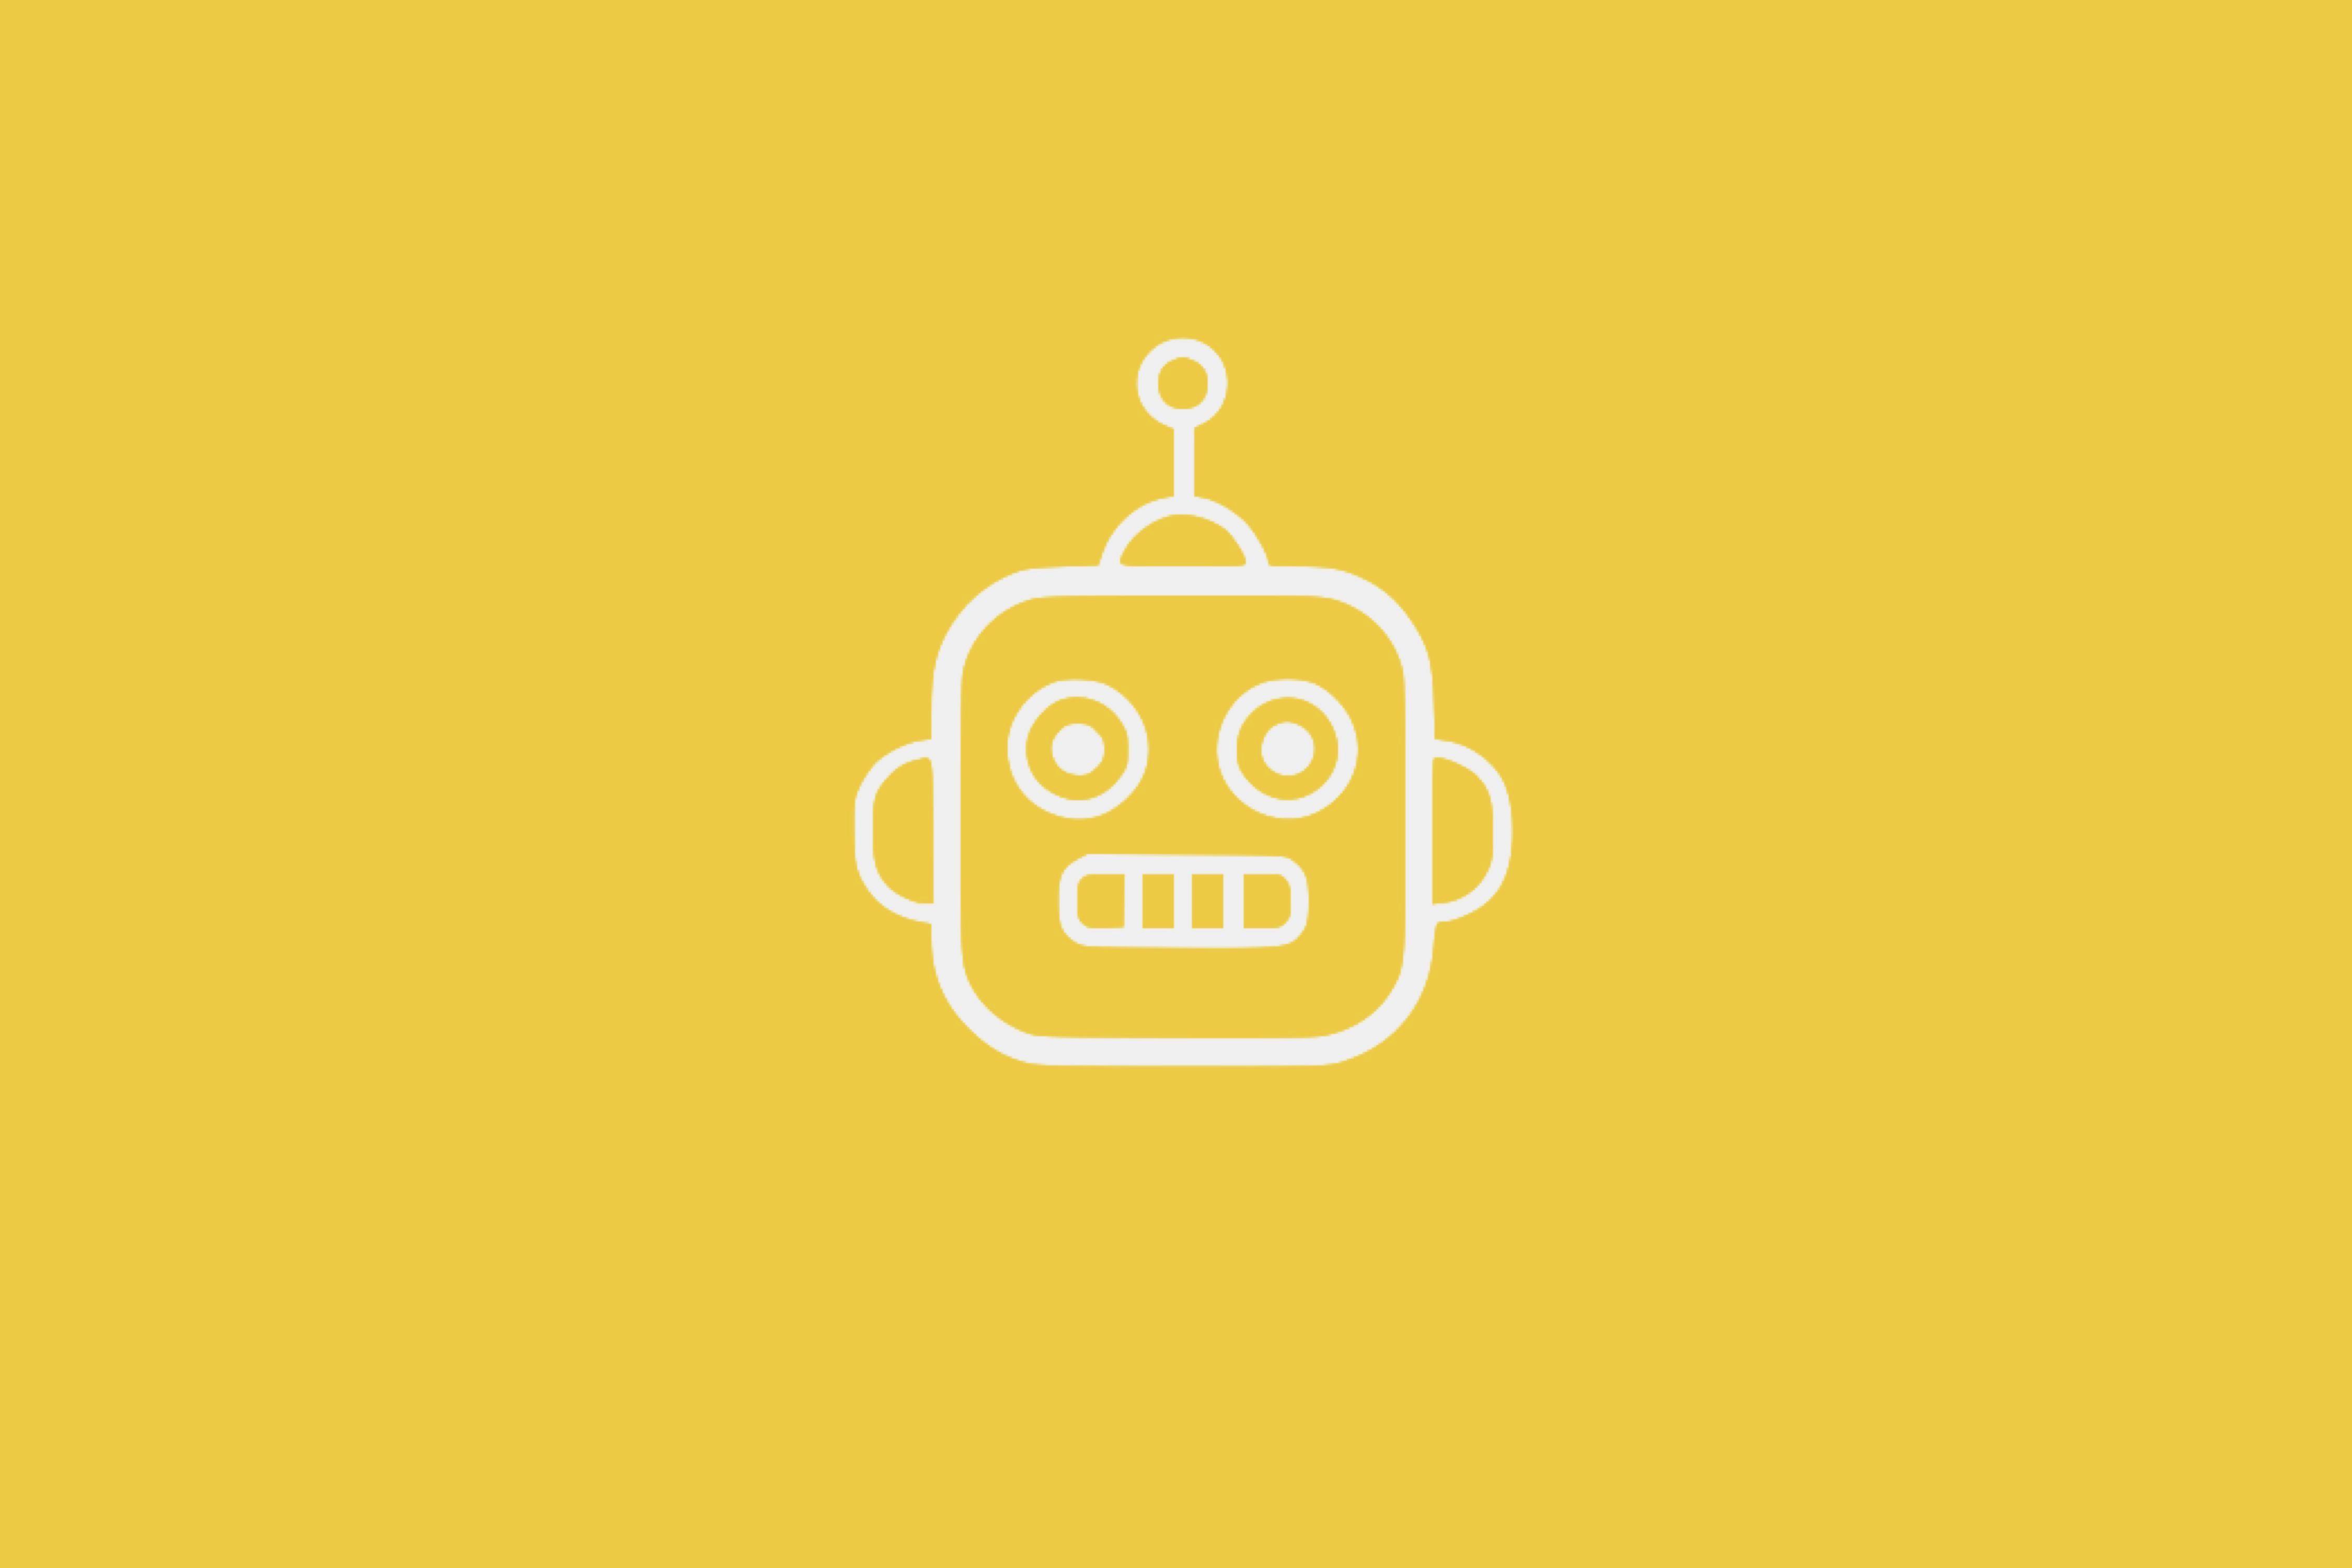 How to stop robocalls spamming your phone | TechCrunch